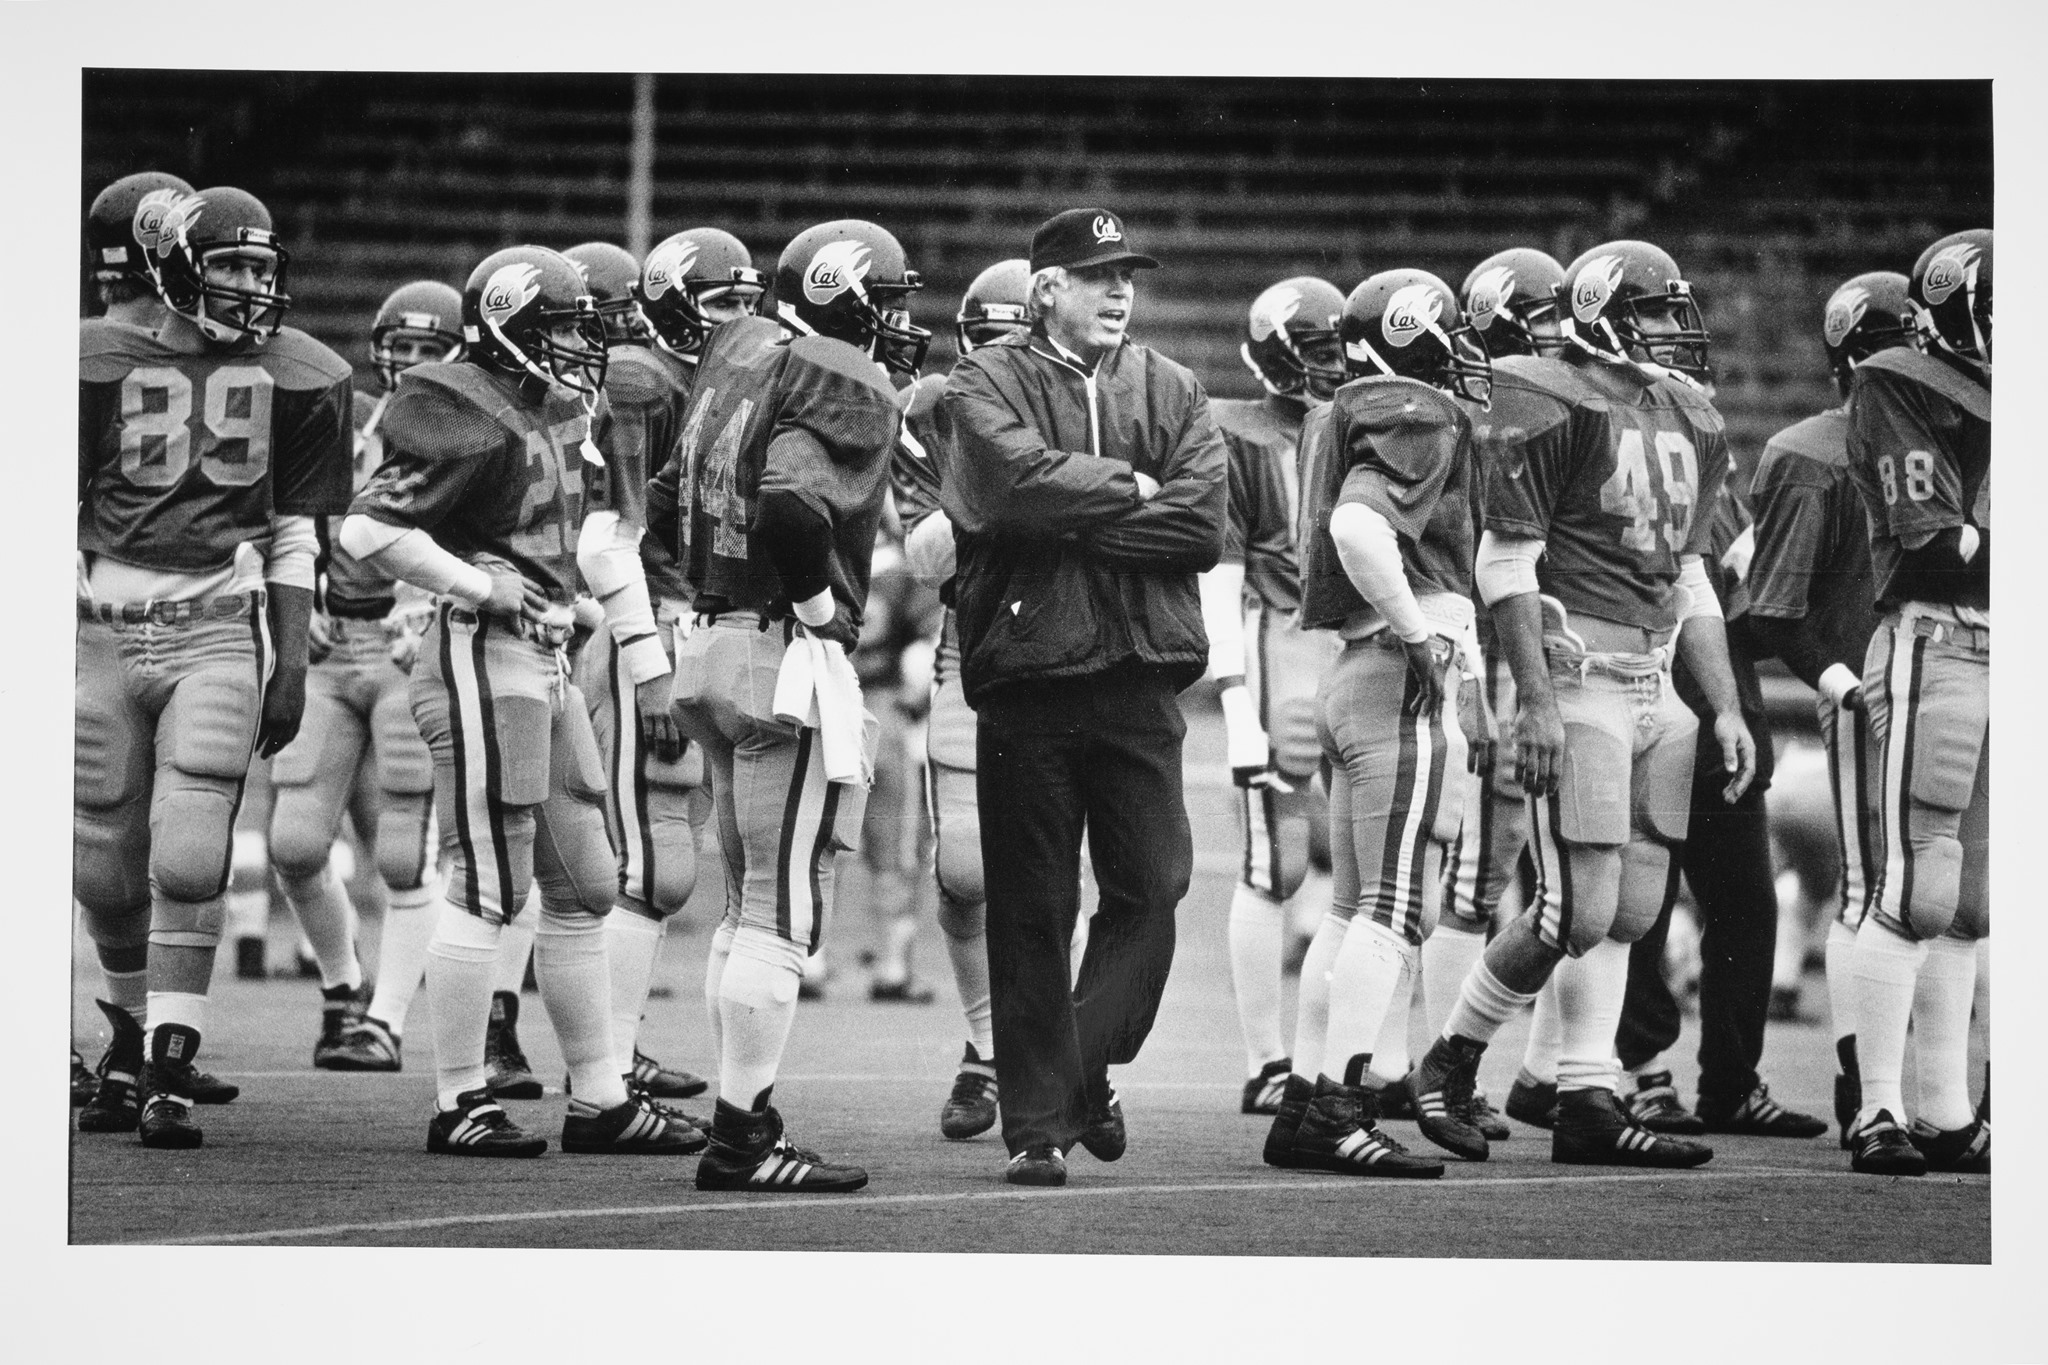 4_Joe_Kapp_head_coach_of_the_Cal_Bears.